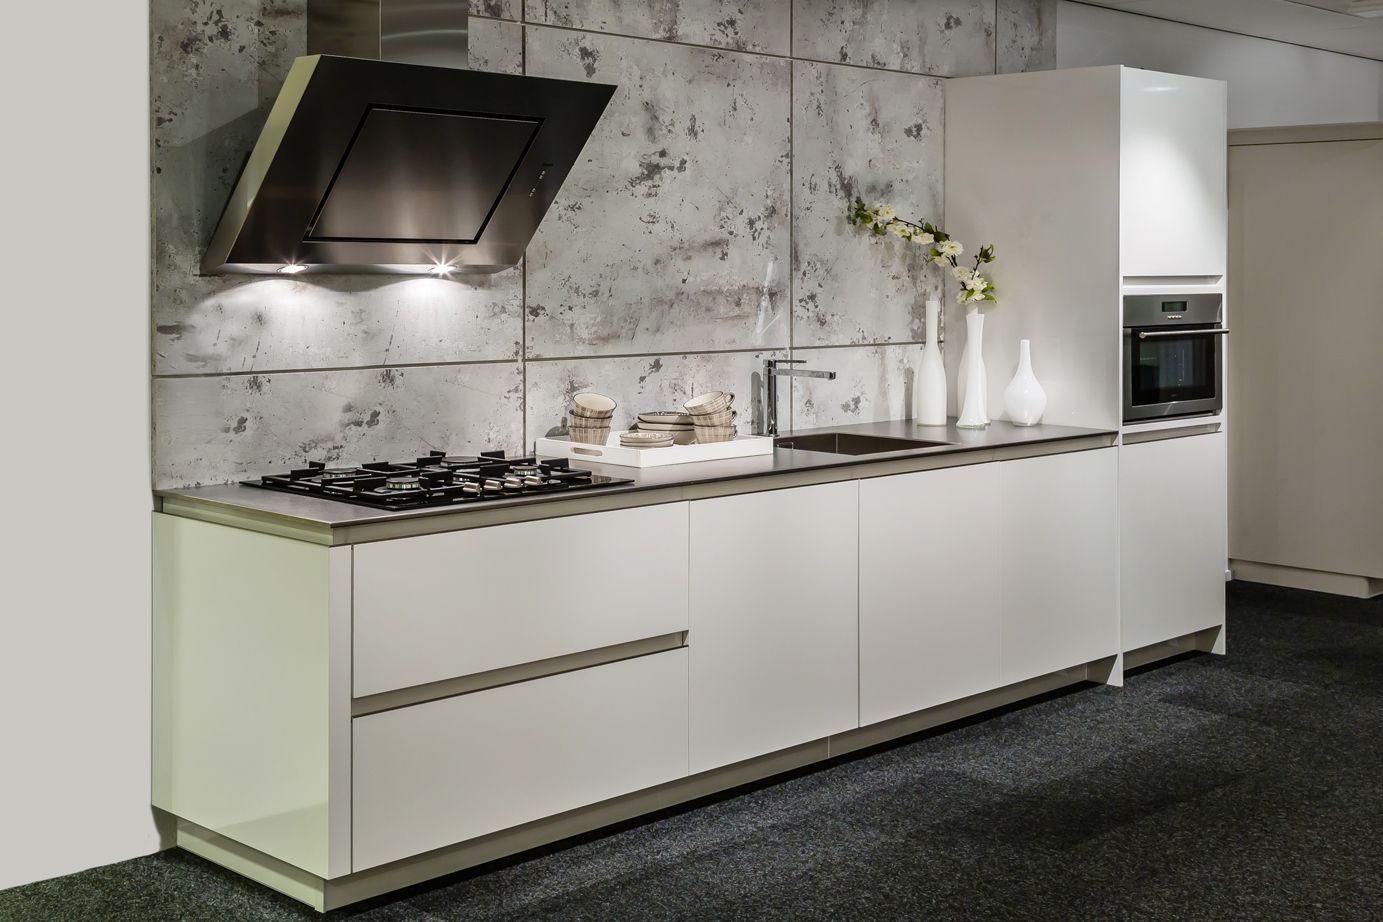 Rvs Design Keuken : Moderne design keuken met rvs aanrechtblad db keukens witte